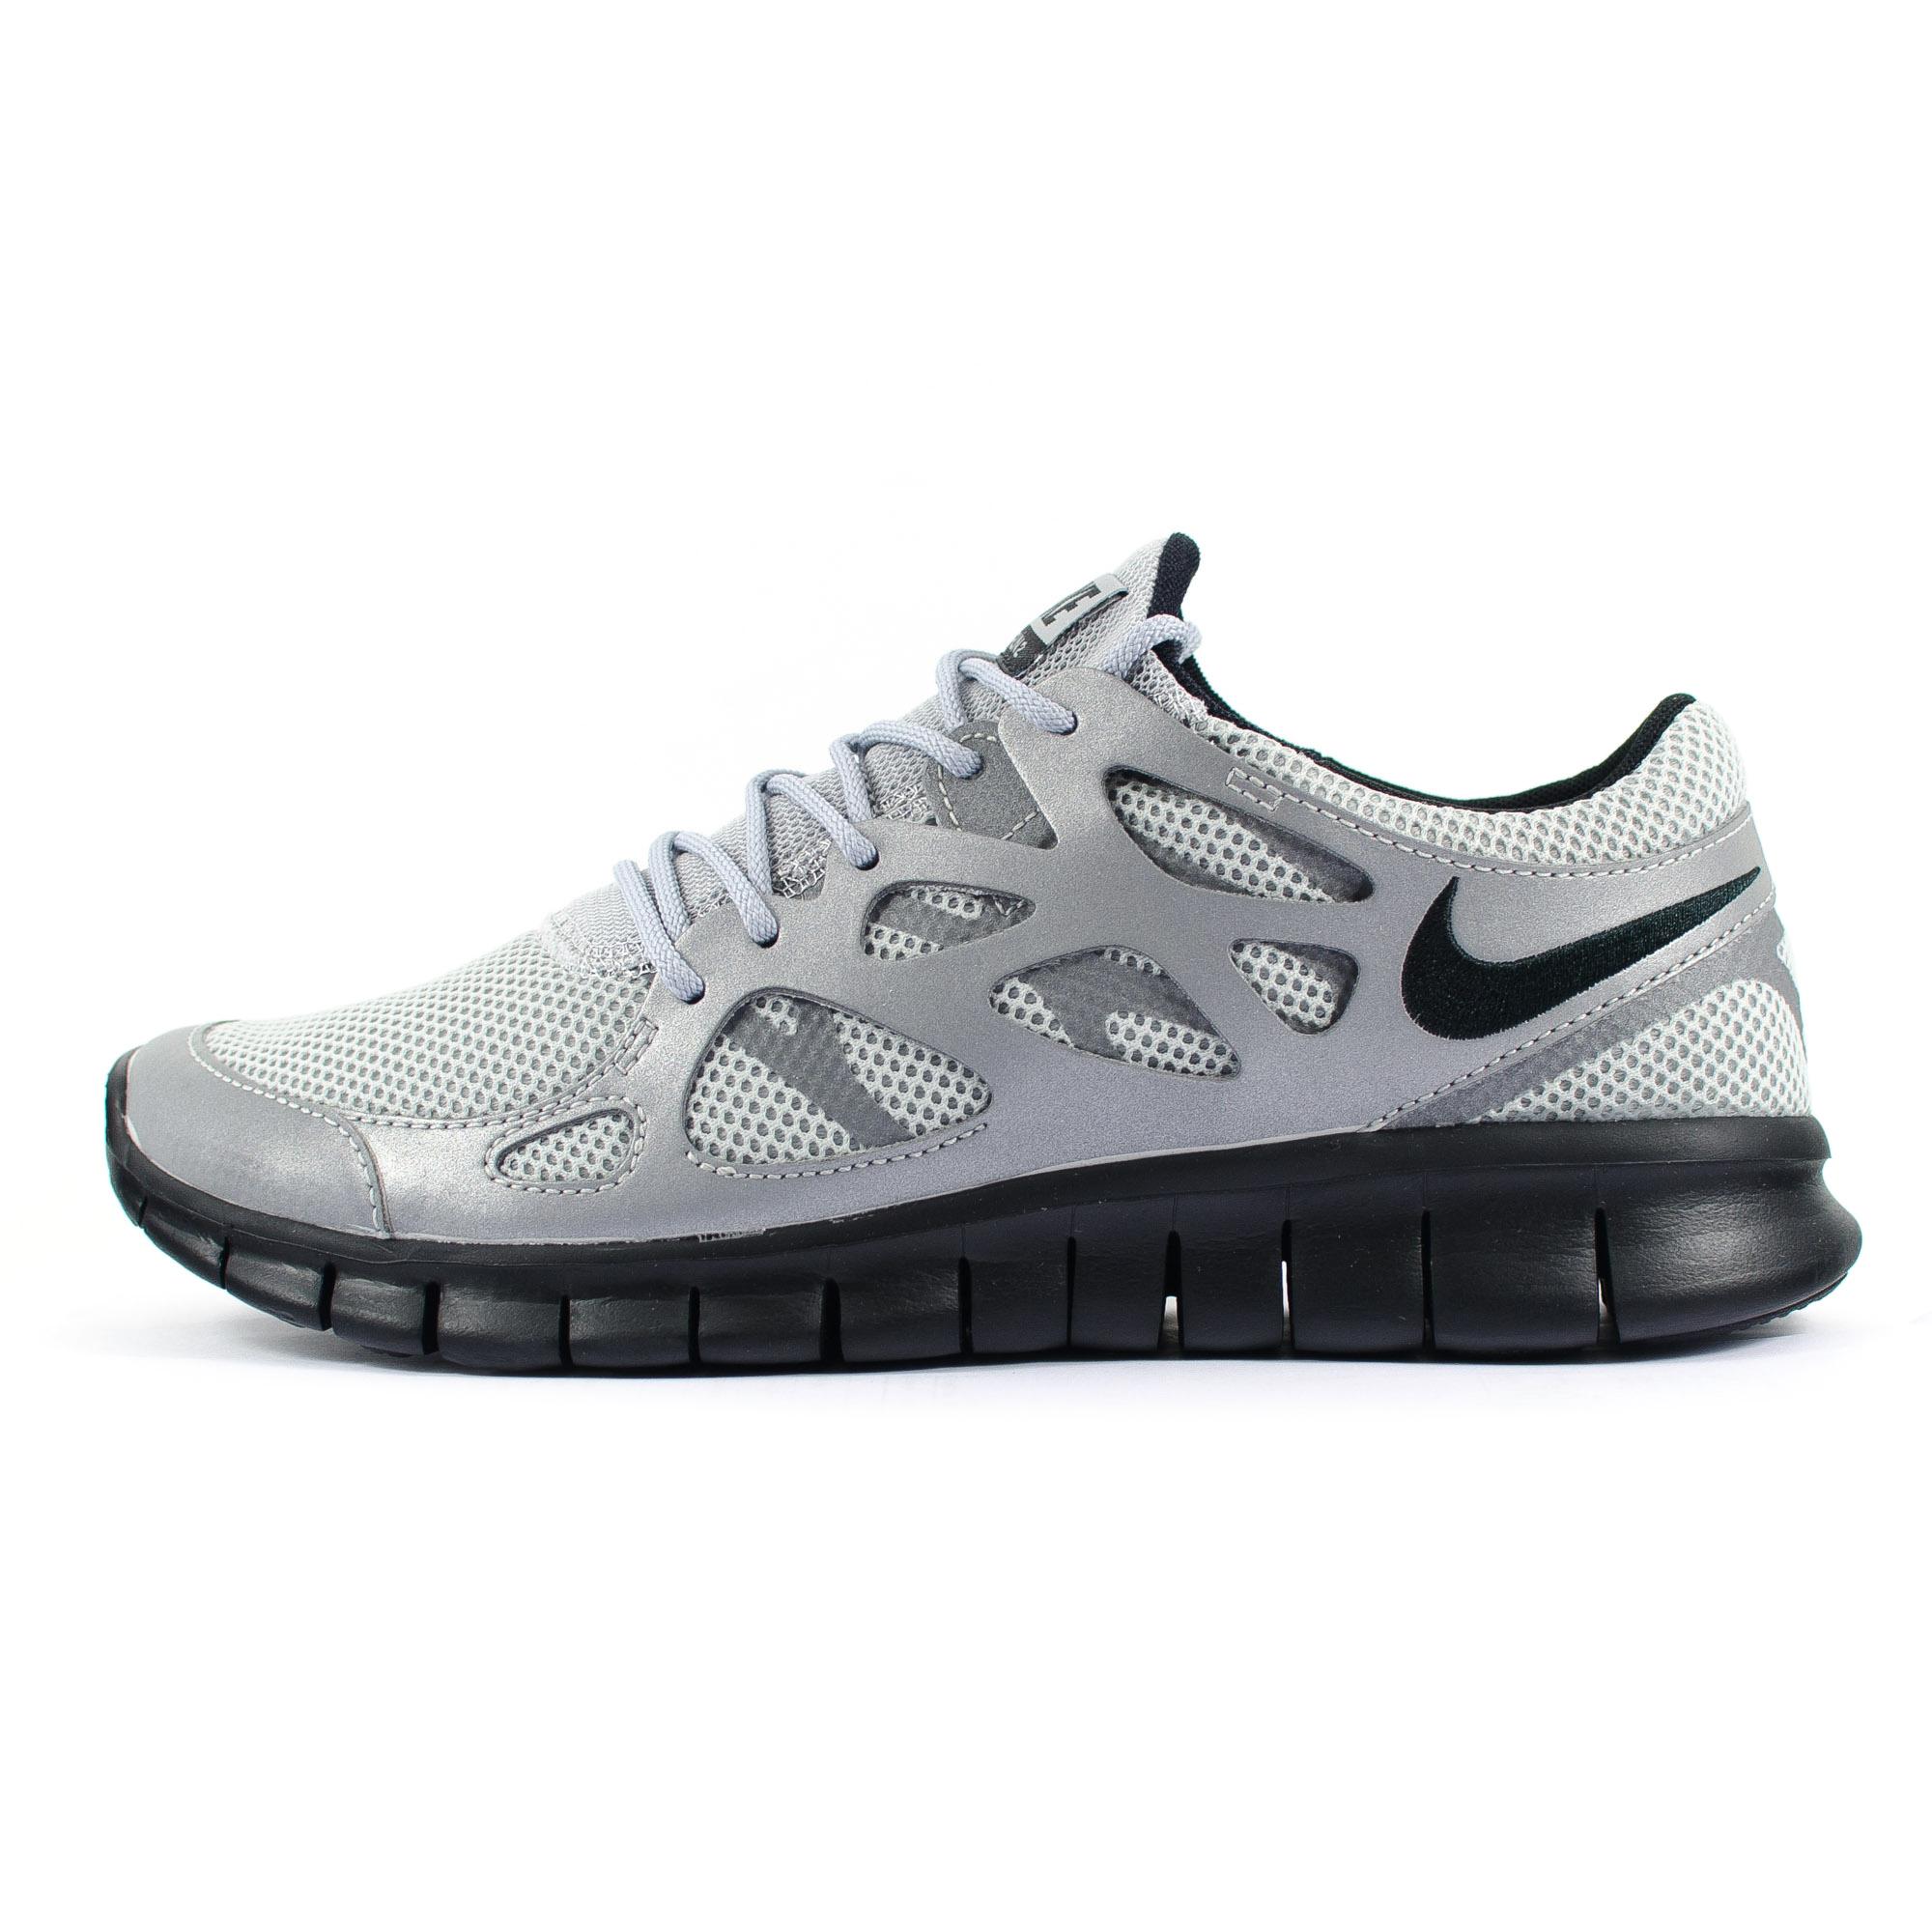 online store 92984 7fa91 Nike Free Run 2 Mens Ebay